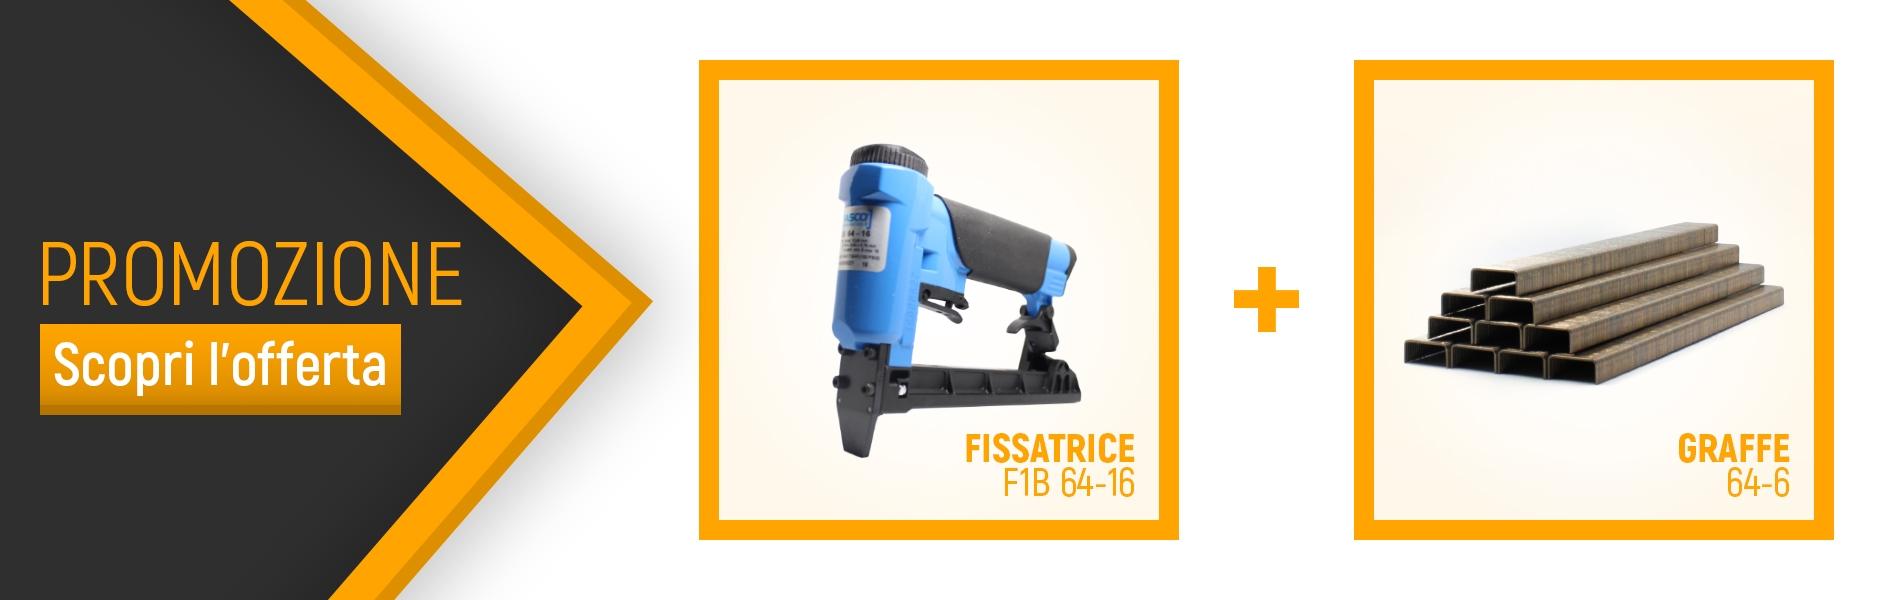 Tooleader - Fasco F1B 64-16 fissatrice + graffe 64/6